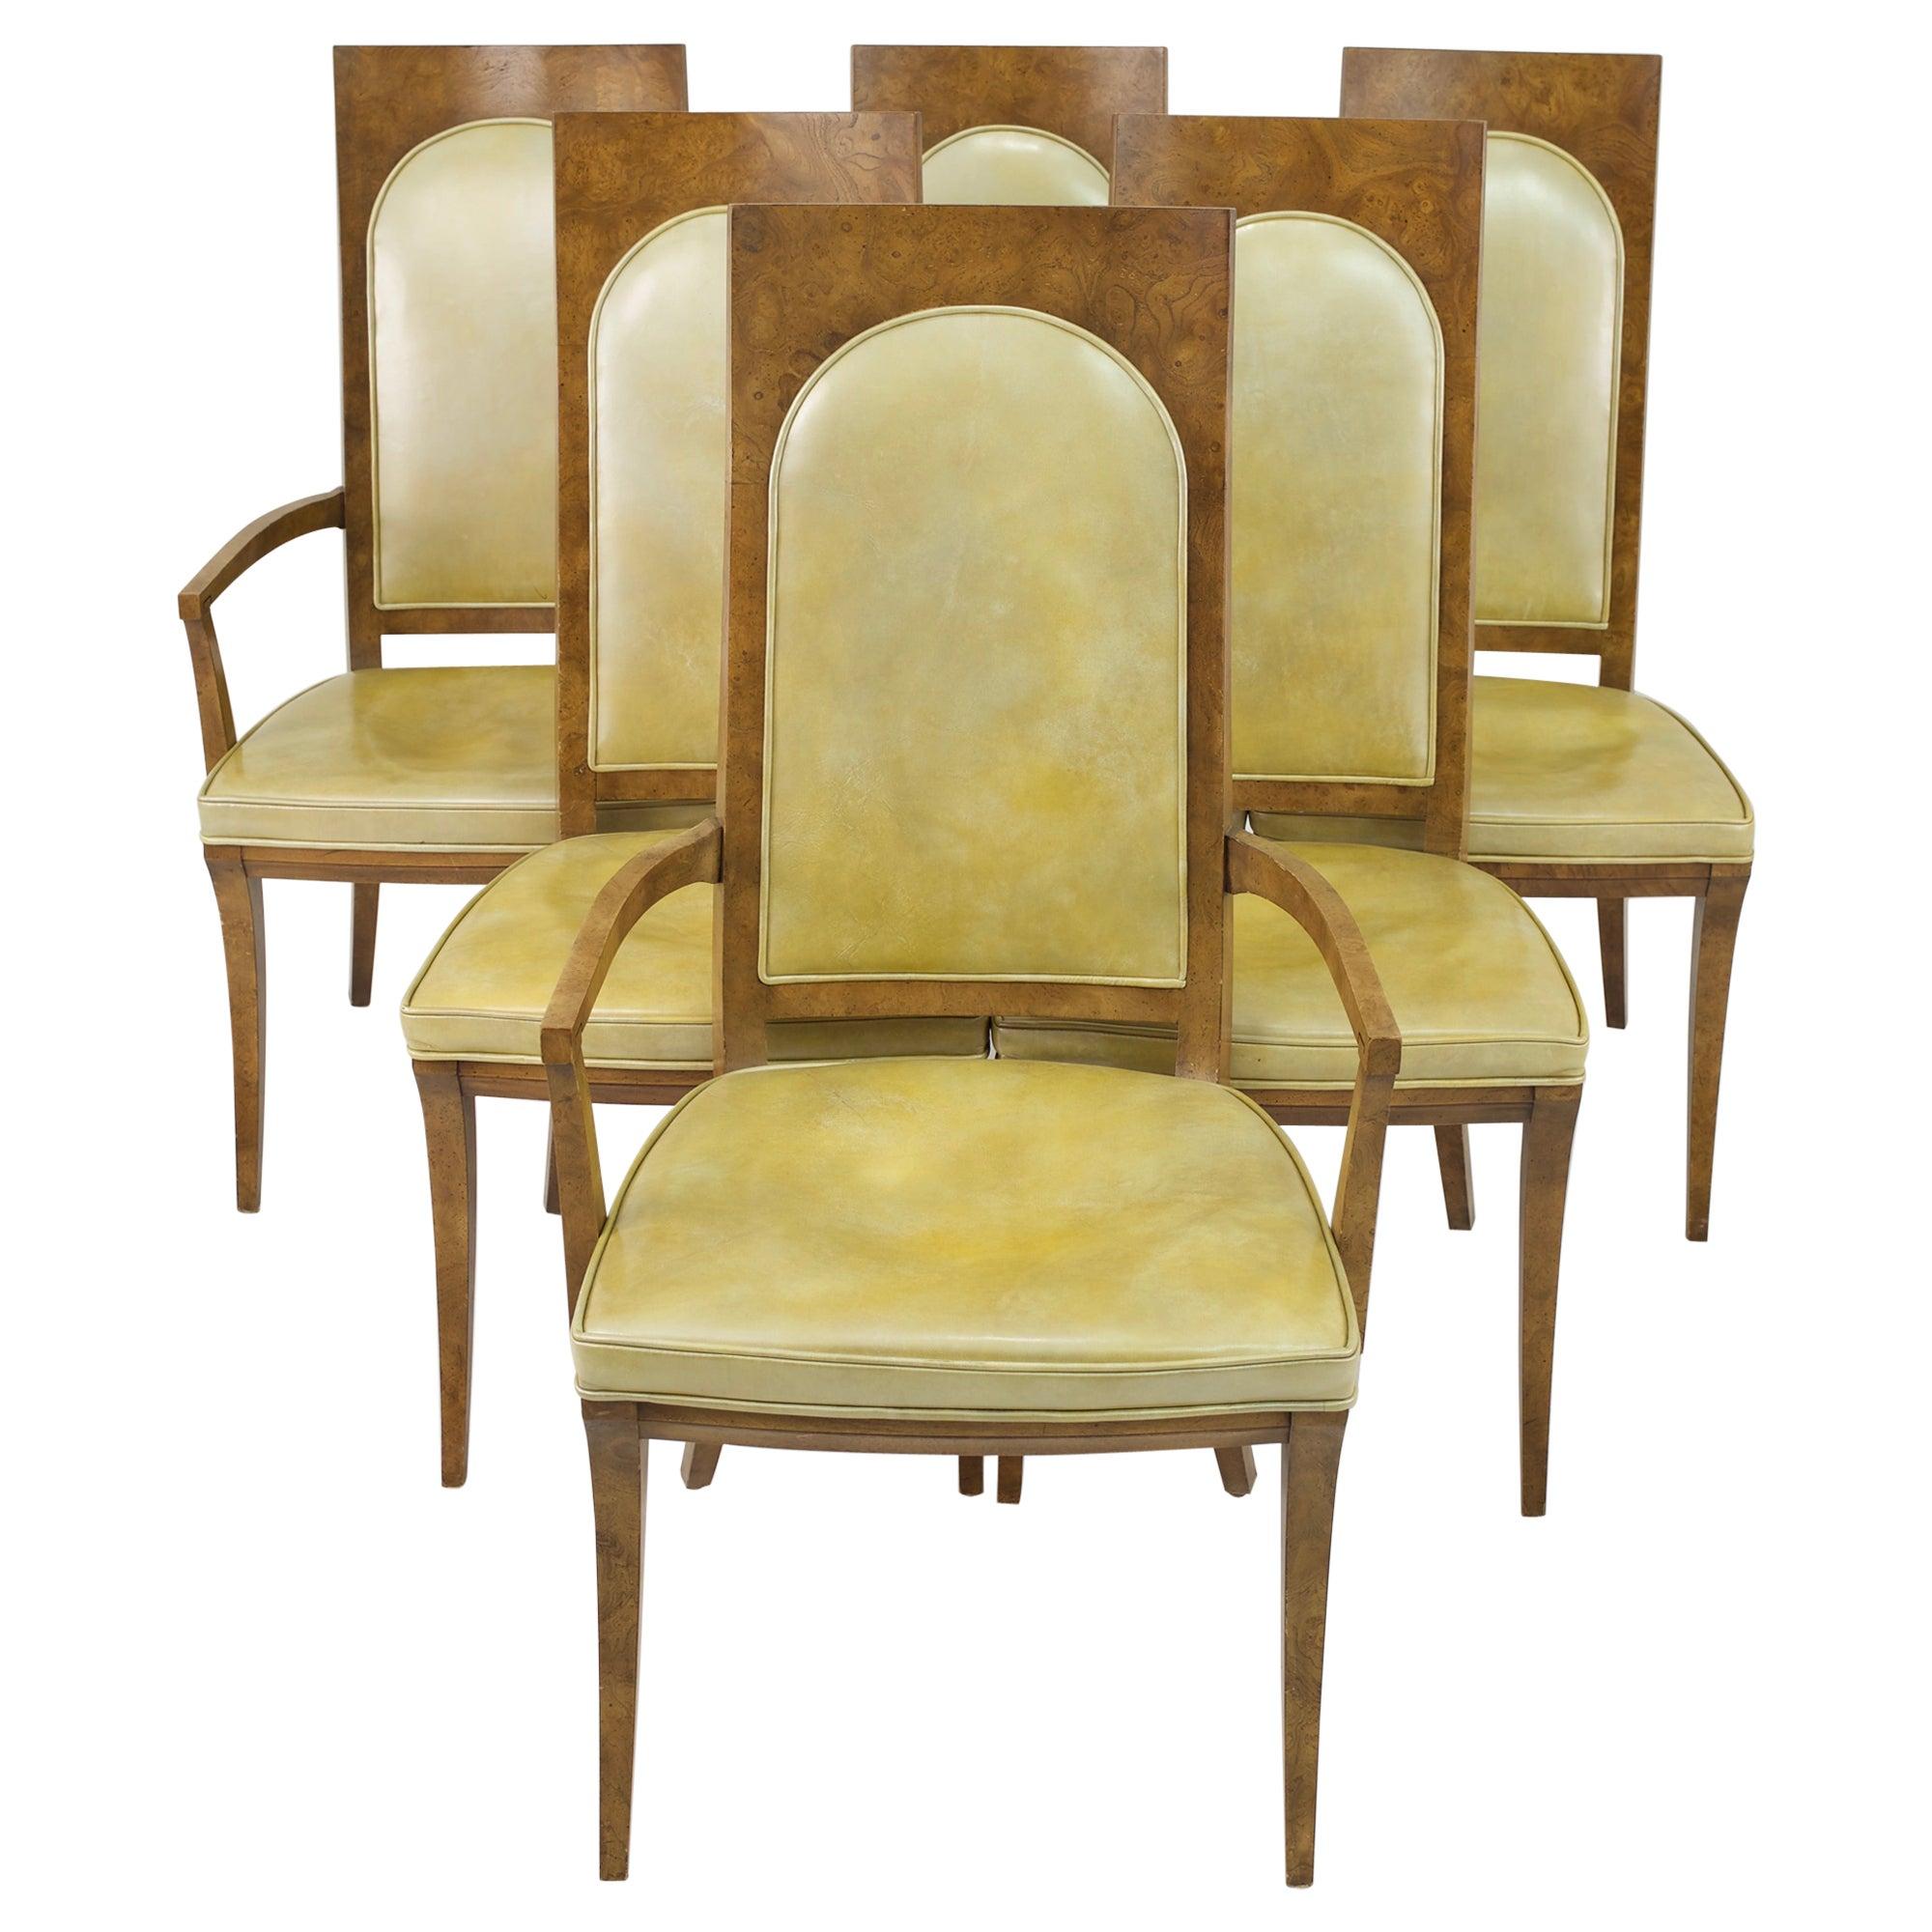 Mastercraft Mid Century Burlwood Dining Chairs - Set of 6